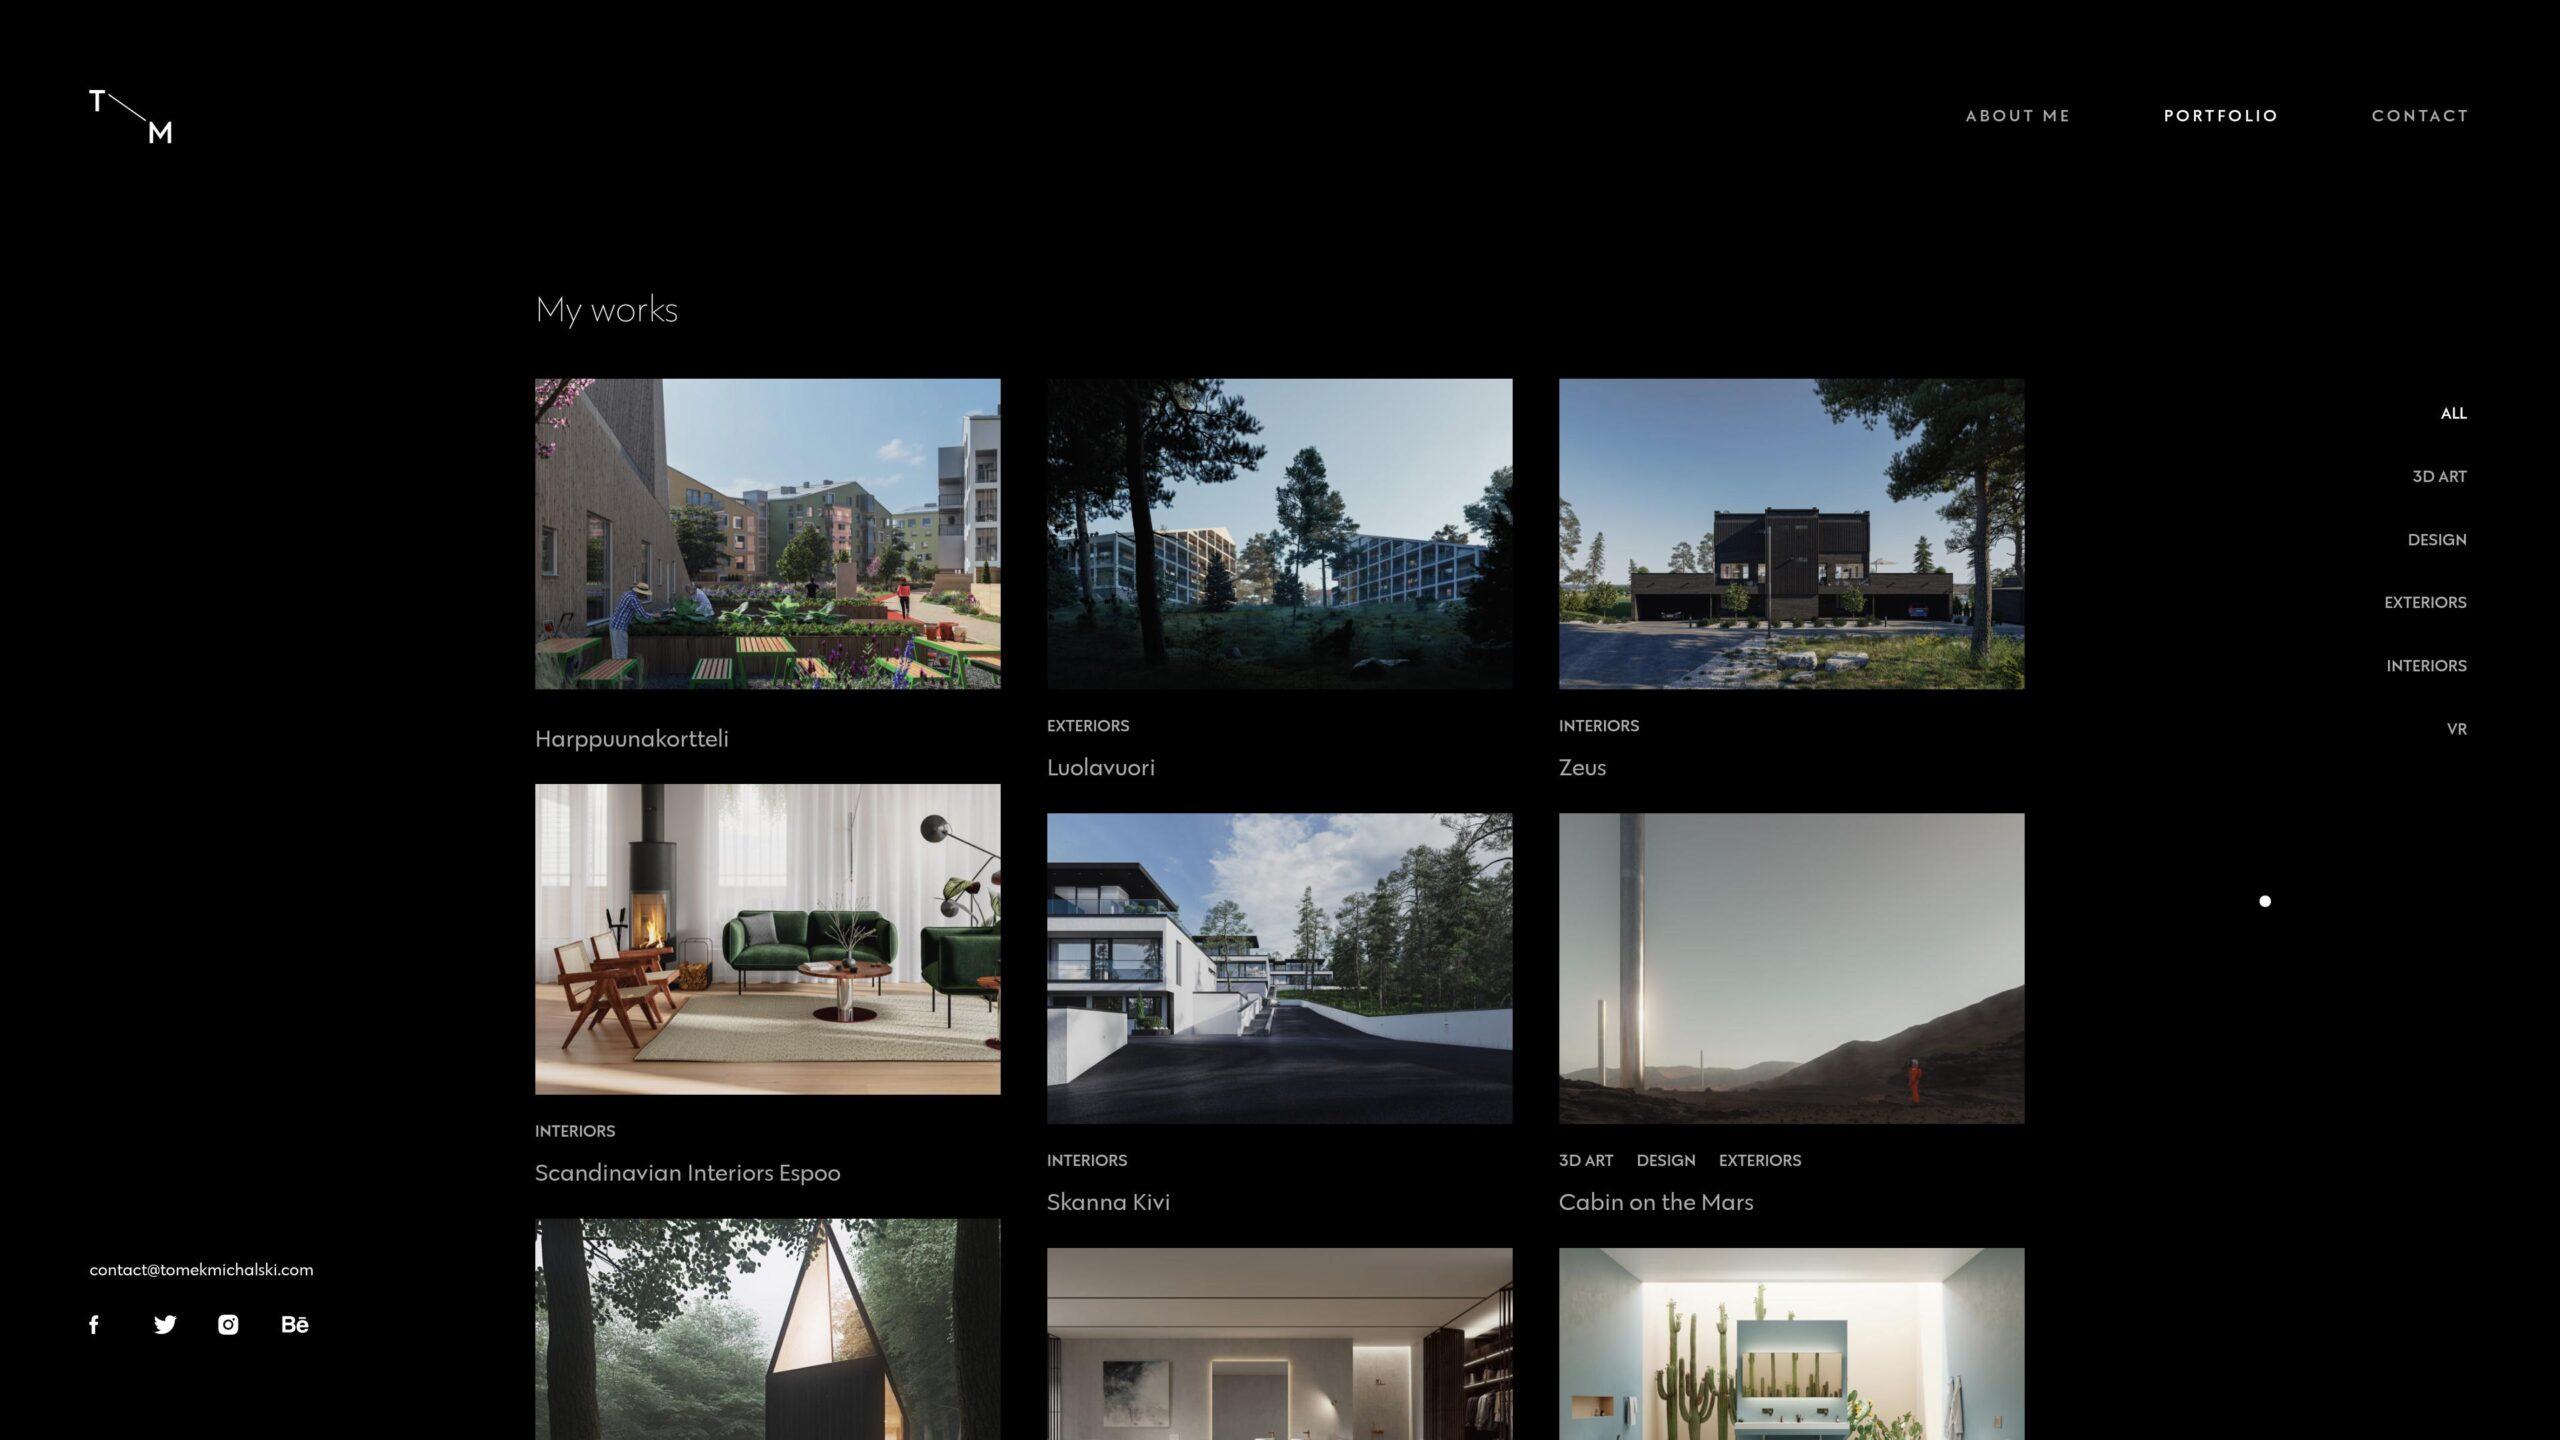 Orpetron Web Design Awards - 3D Artist – Tomek Michalski - Web Design Awards Inspiration Trends UI UX